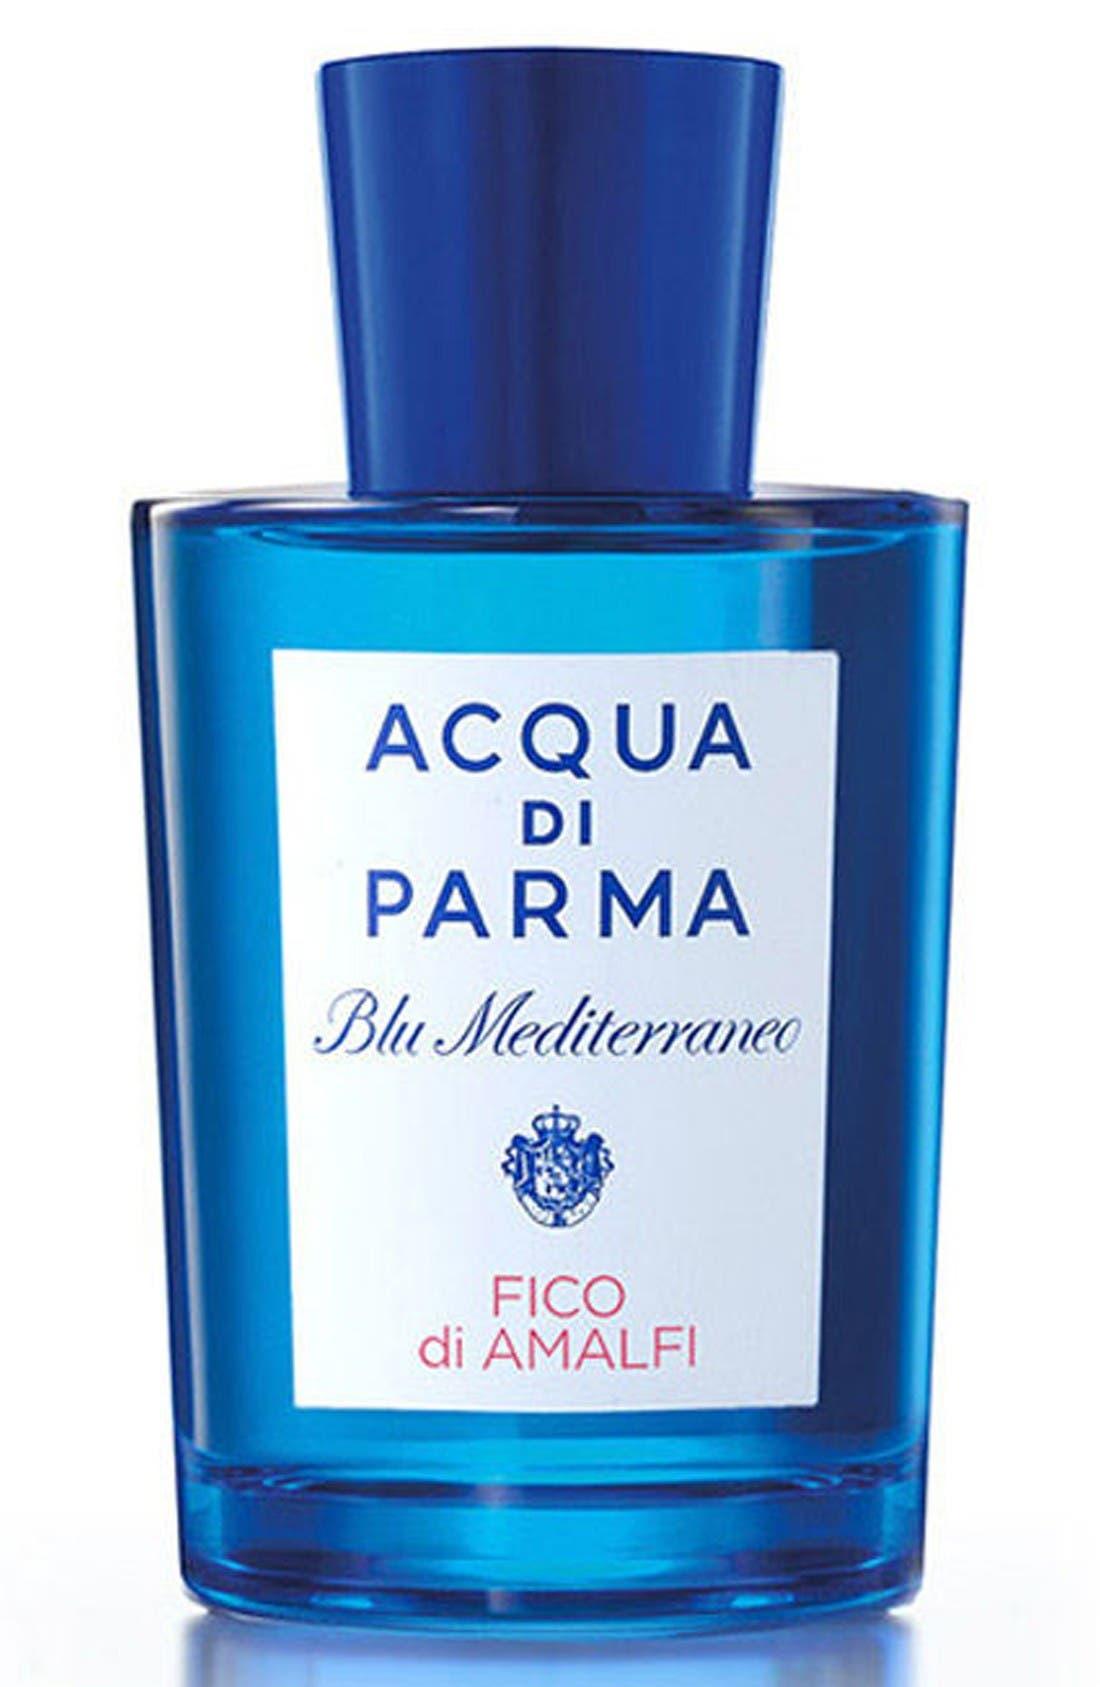 Acqua di Parma 'Blu Mediterraneo' Fico di Amalfi Eau de Toilette Spray